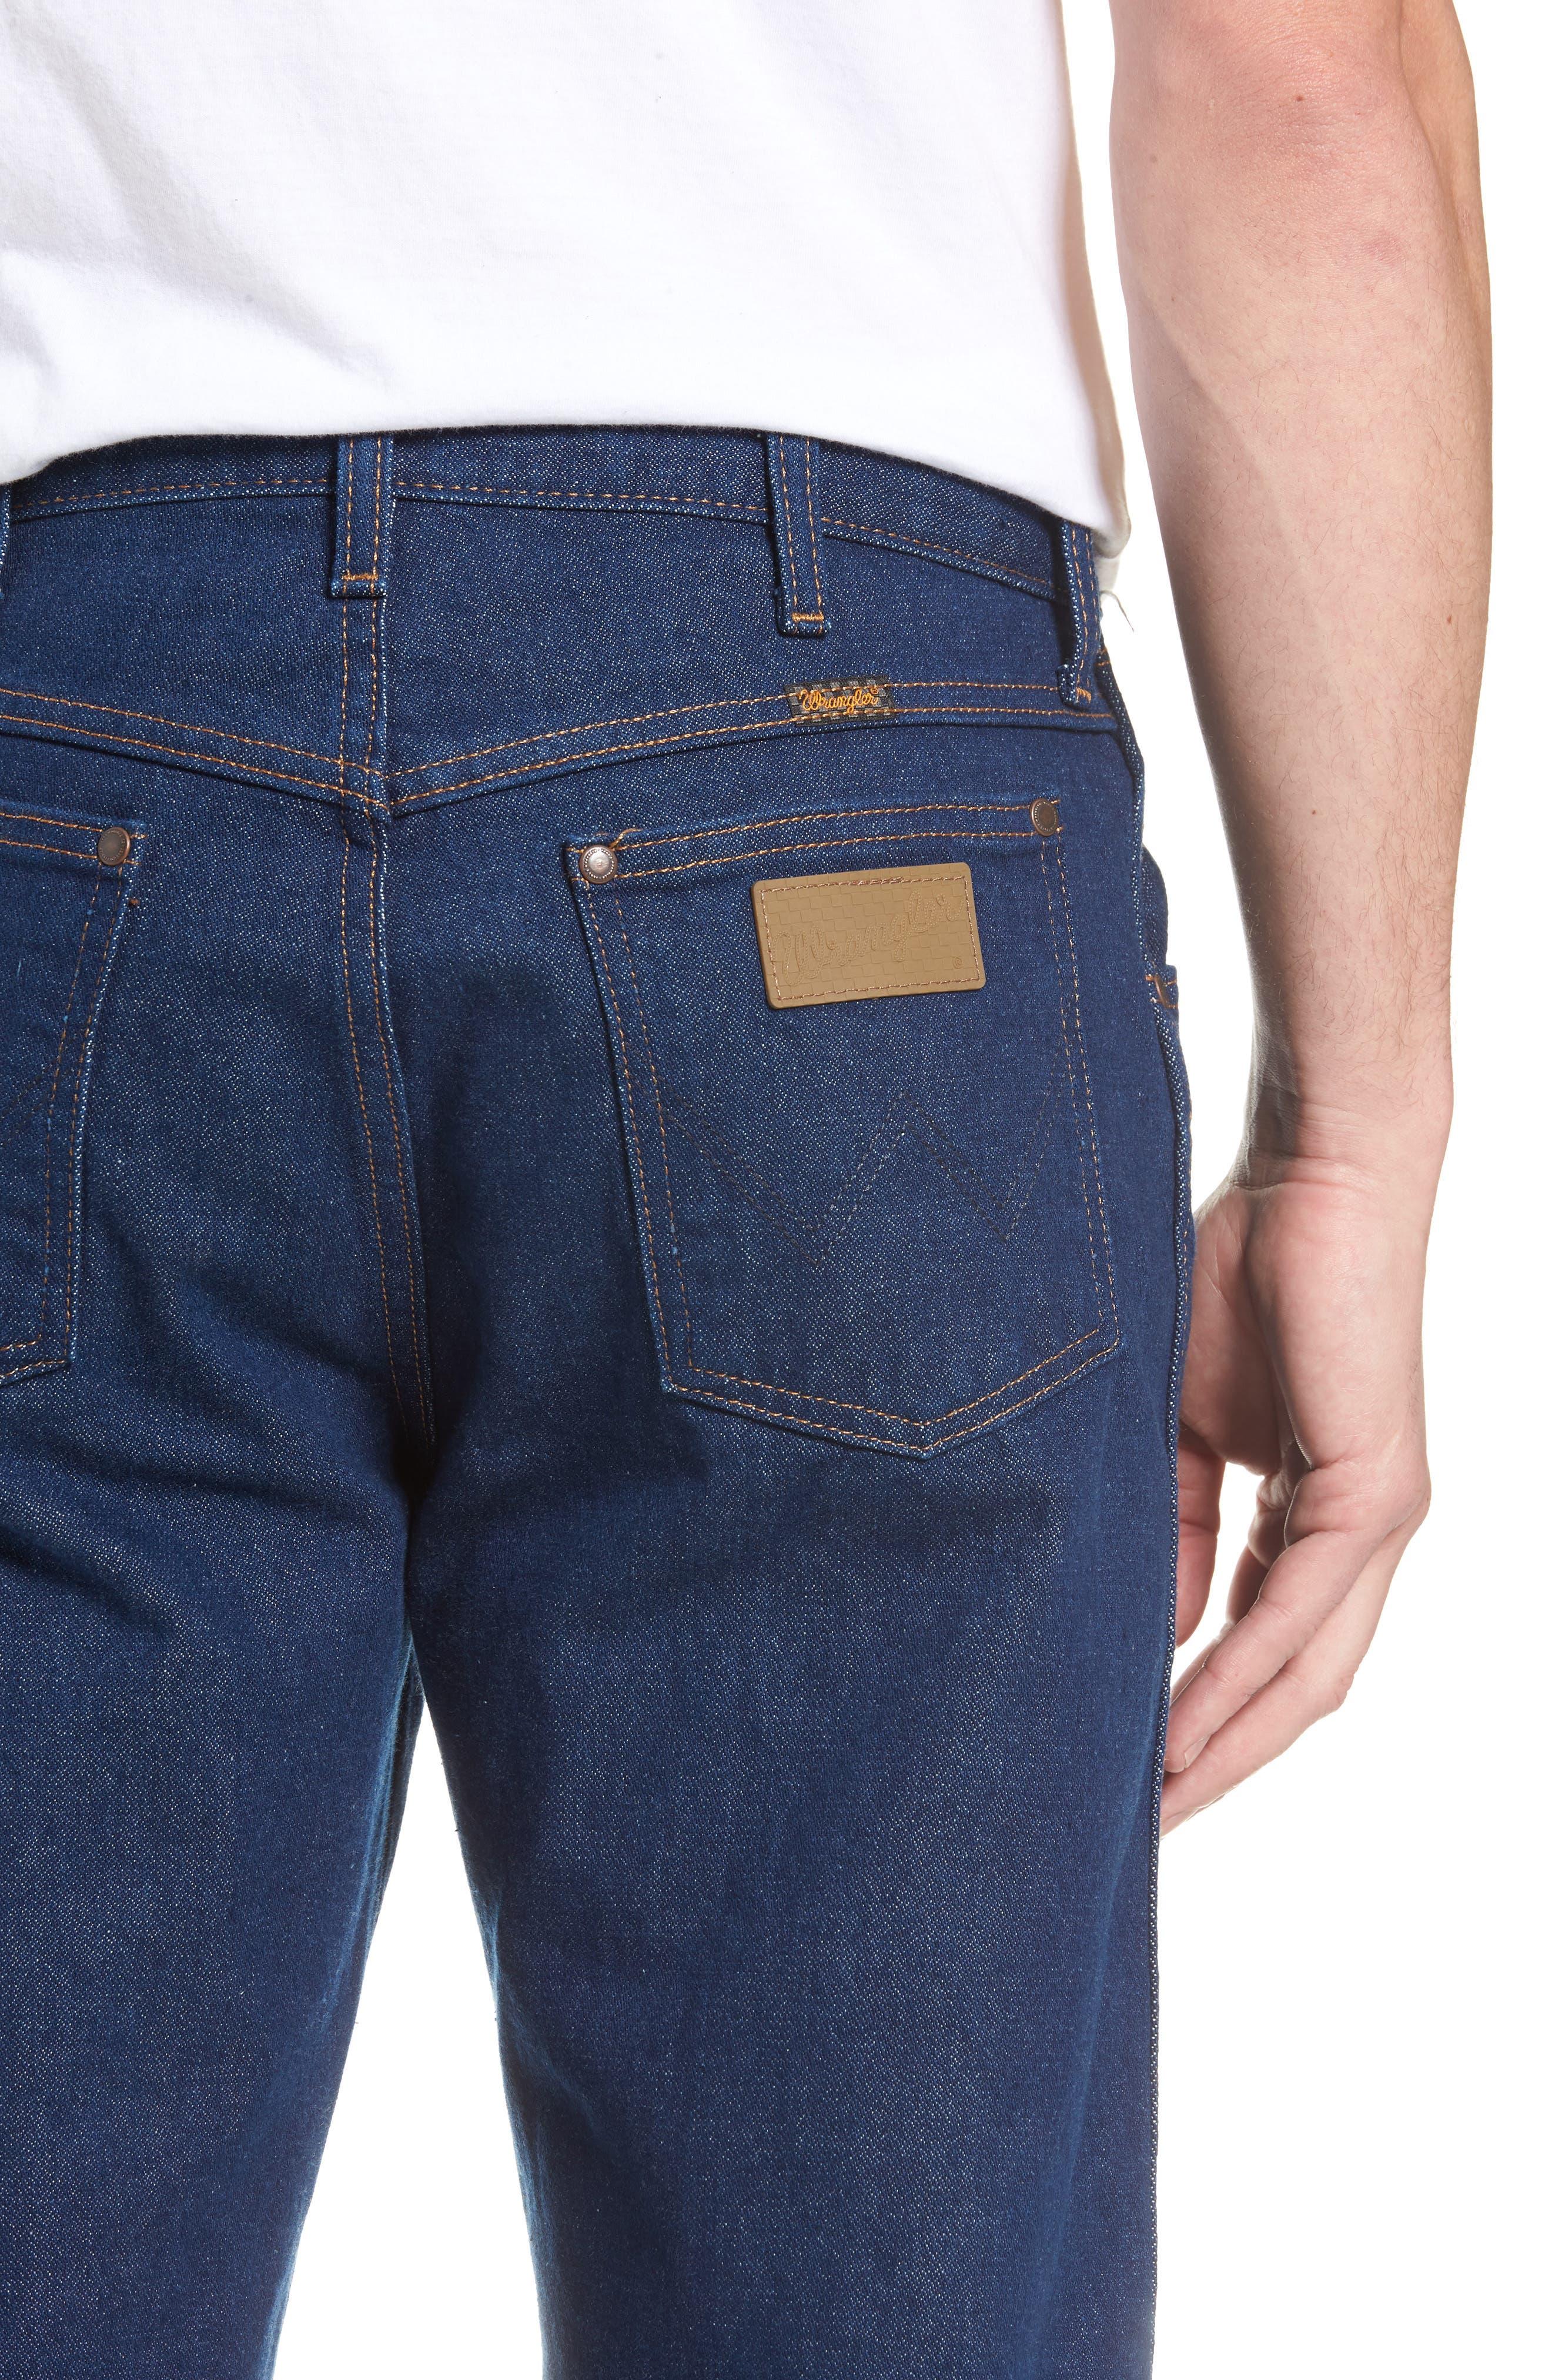 x Wrangler Straight Leg Jeans,                             Alternate thumbnail 4, color,                             PREWASH INDIGO